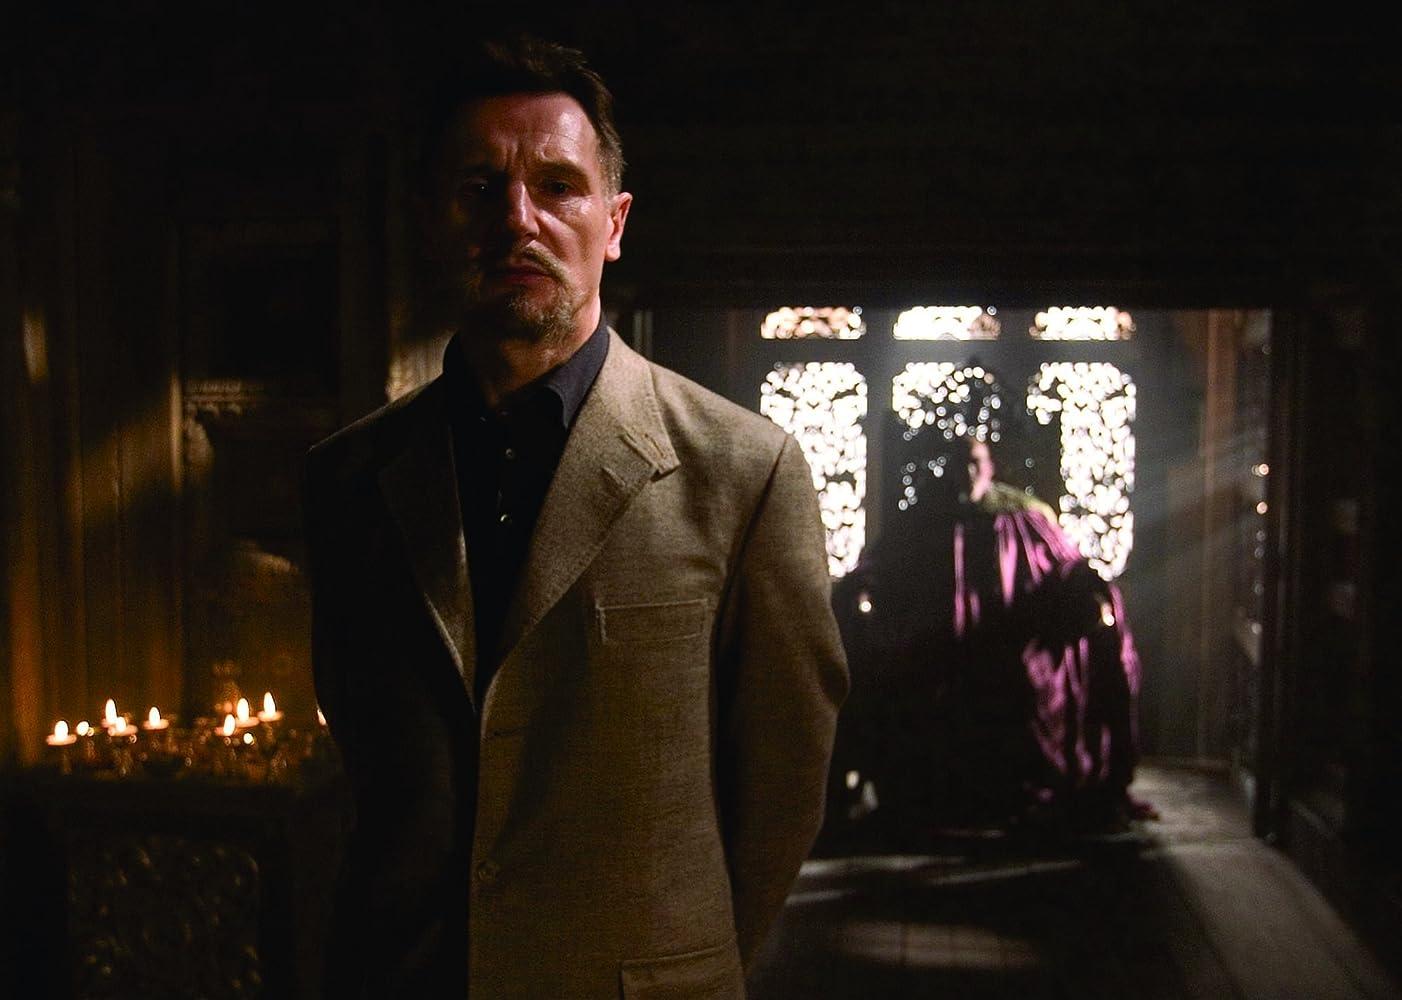 Liam Neeson and Ken Watanabe in Batman Begins (2005)